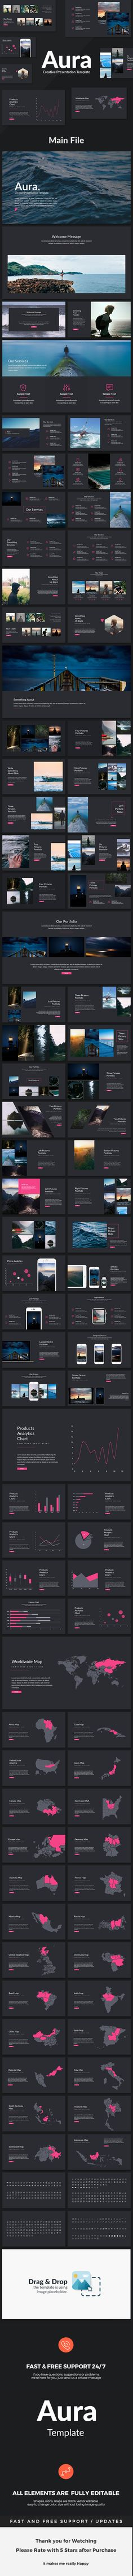 Aura  Creative Keynote Template — Keynote KEY #free icons #easy • Download ➝ https://graphicriver.net/item/aura-creative-keynote-template/19103352?ref=pxcr